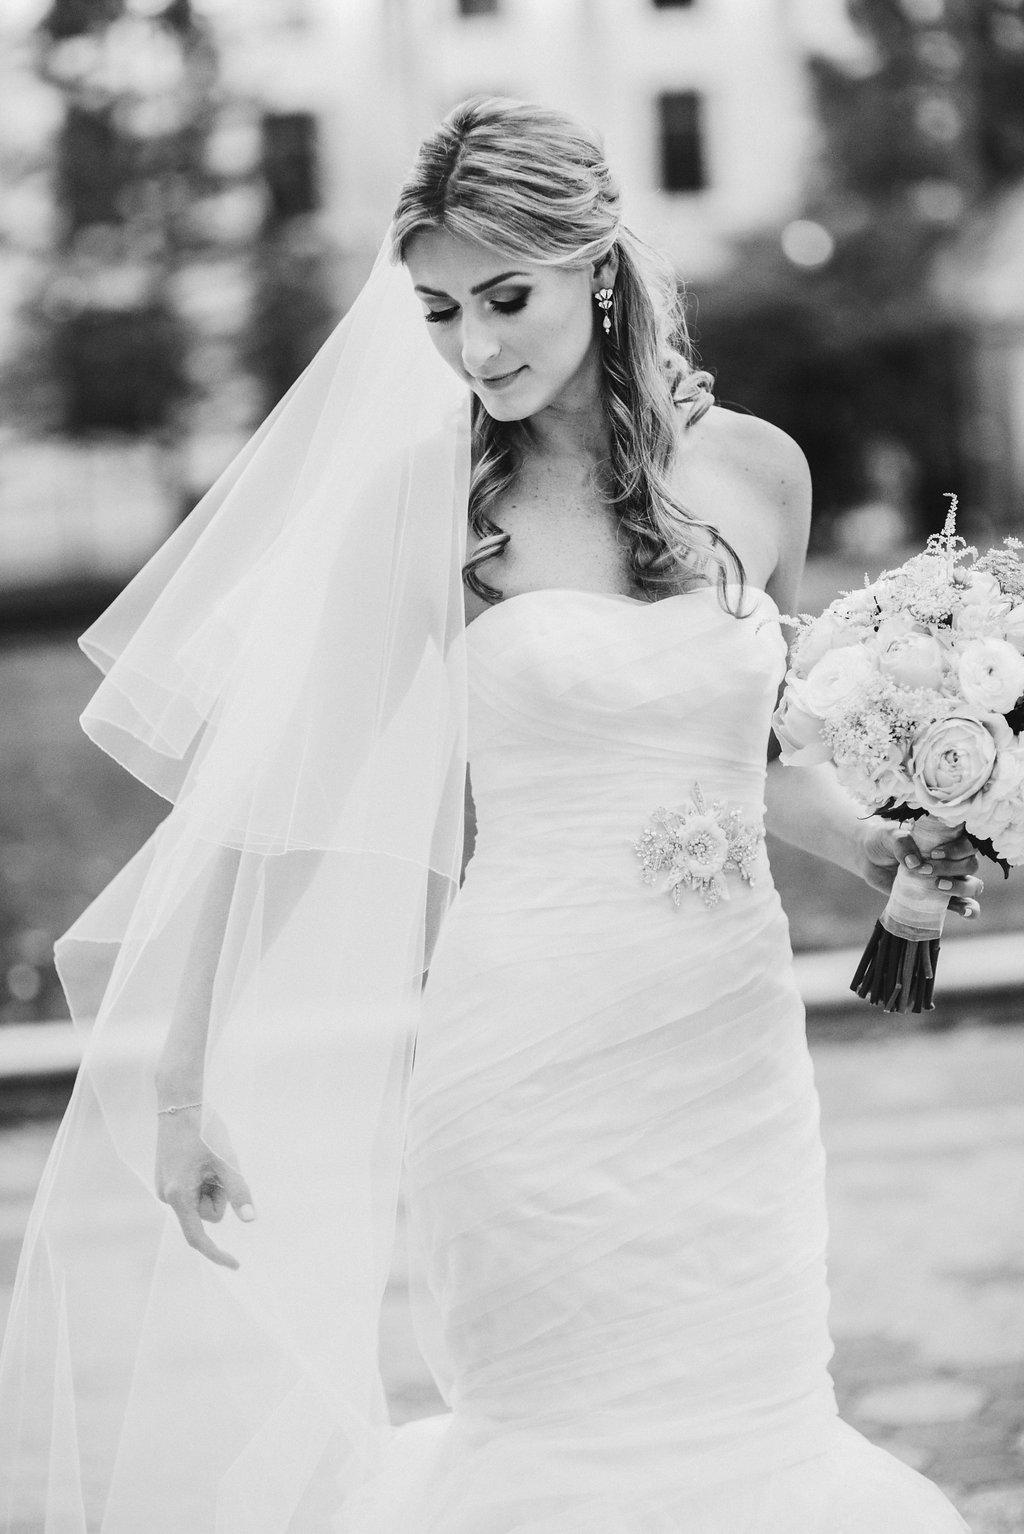 003 Hotel DuPont Wedding Aribella Events Bridal Portrait.jpg